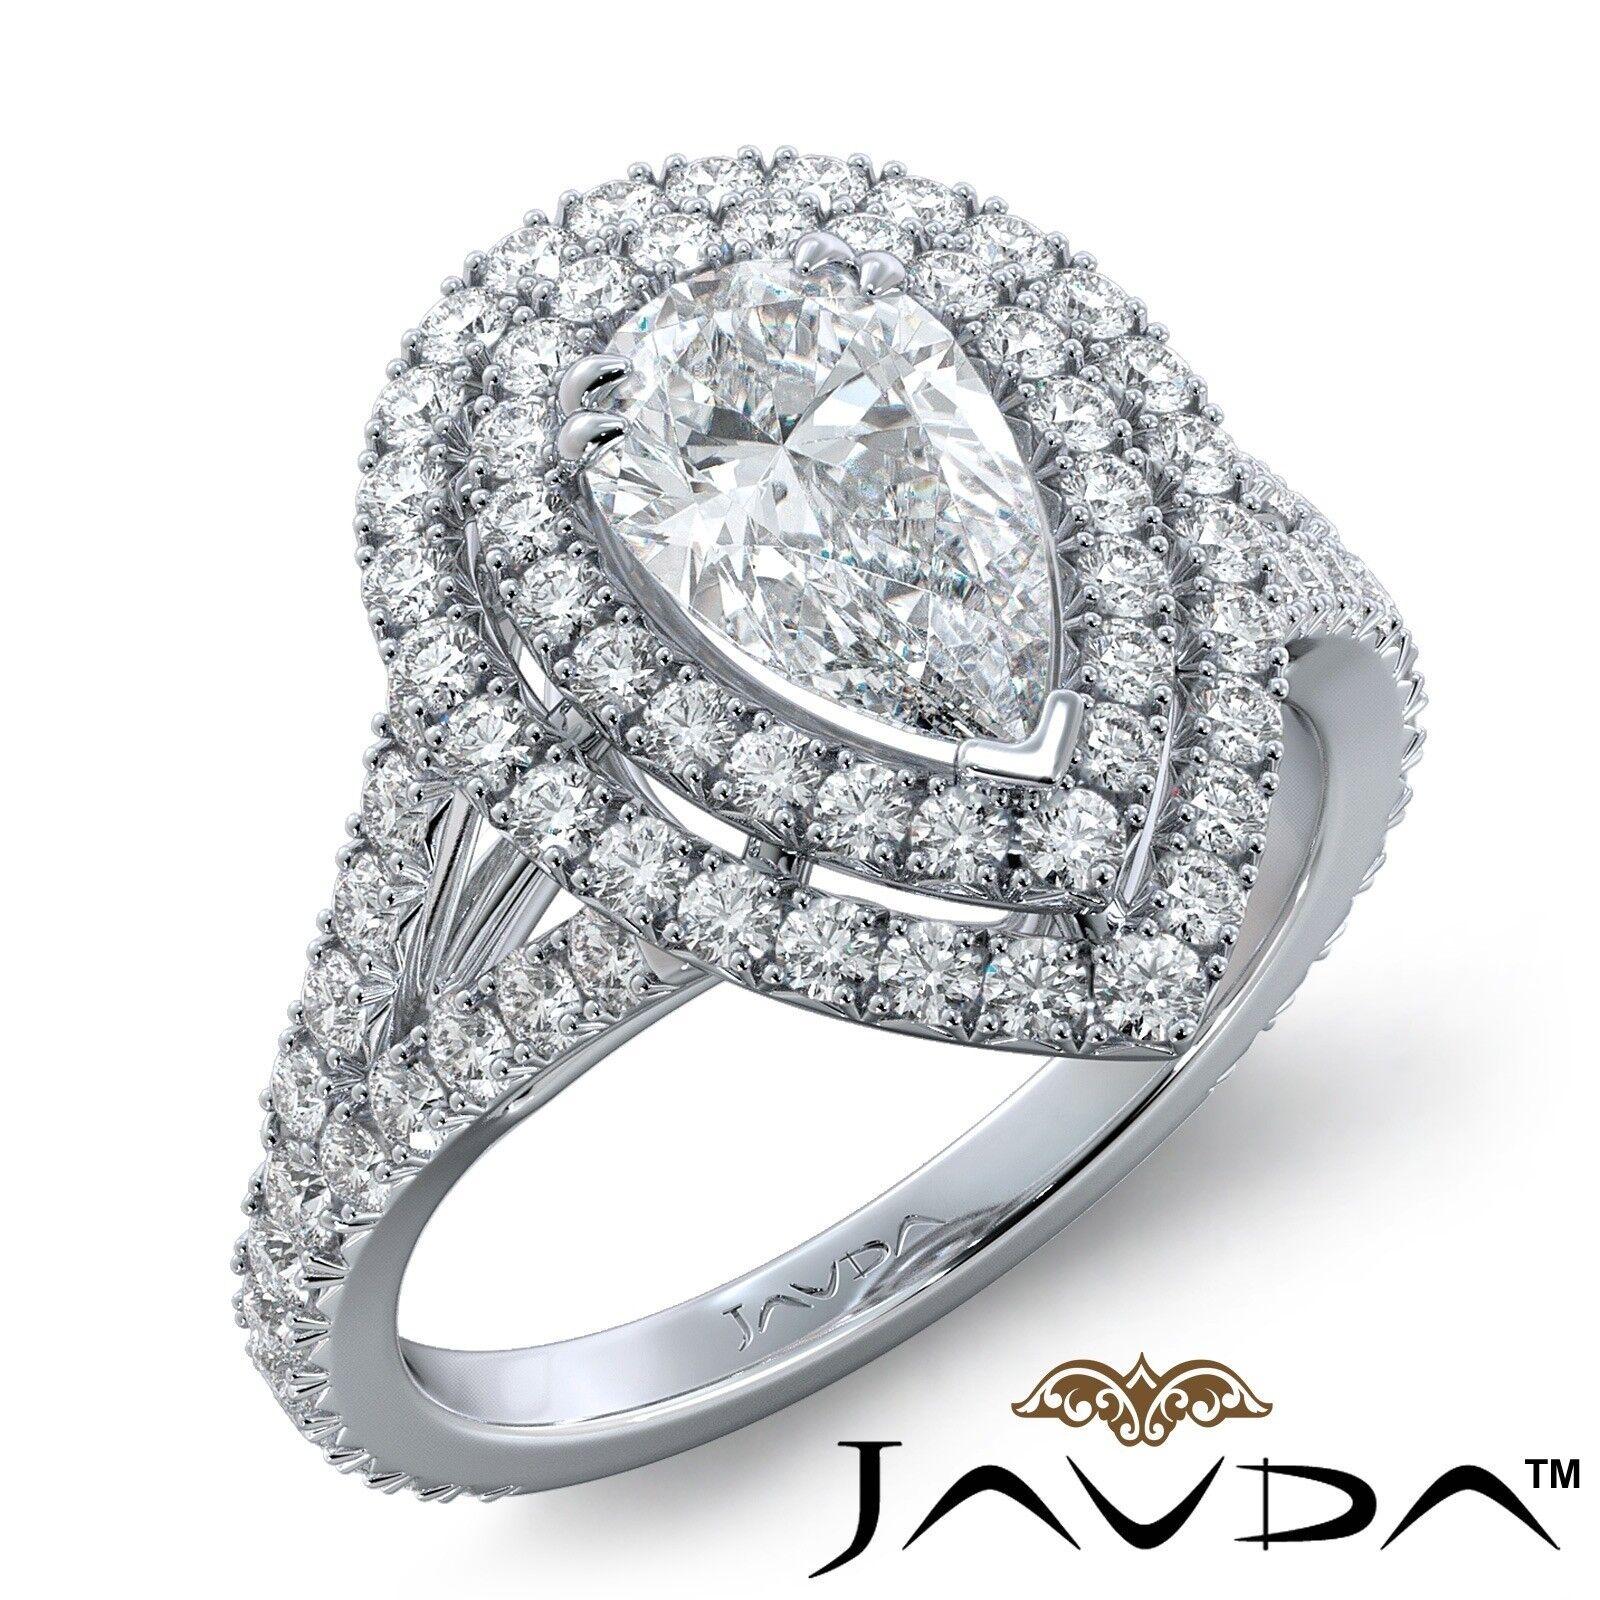 2.24ctw Duet Halo Split Shank Pear Diamond Engagement Ring GIA I-VVS1 White Gold